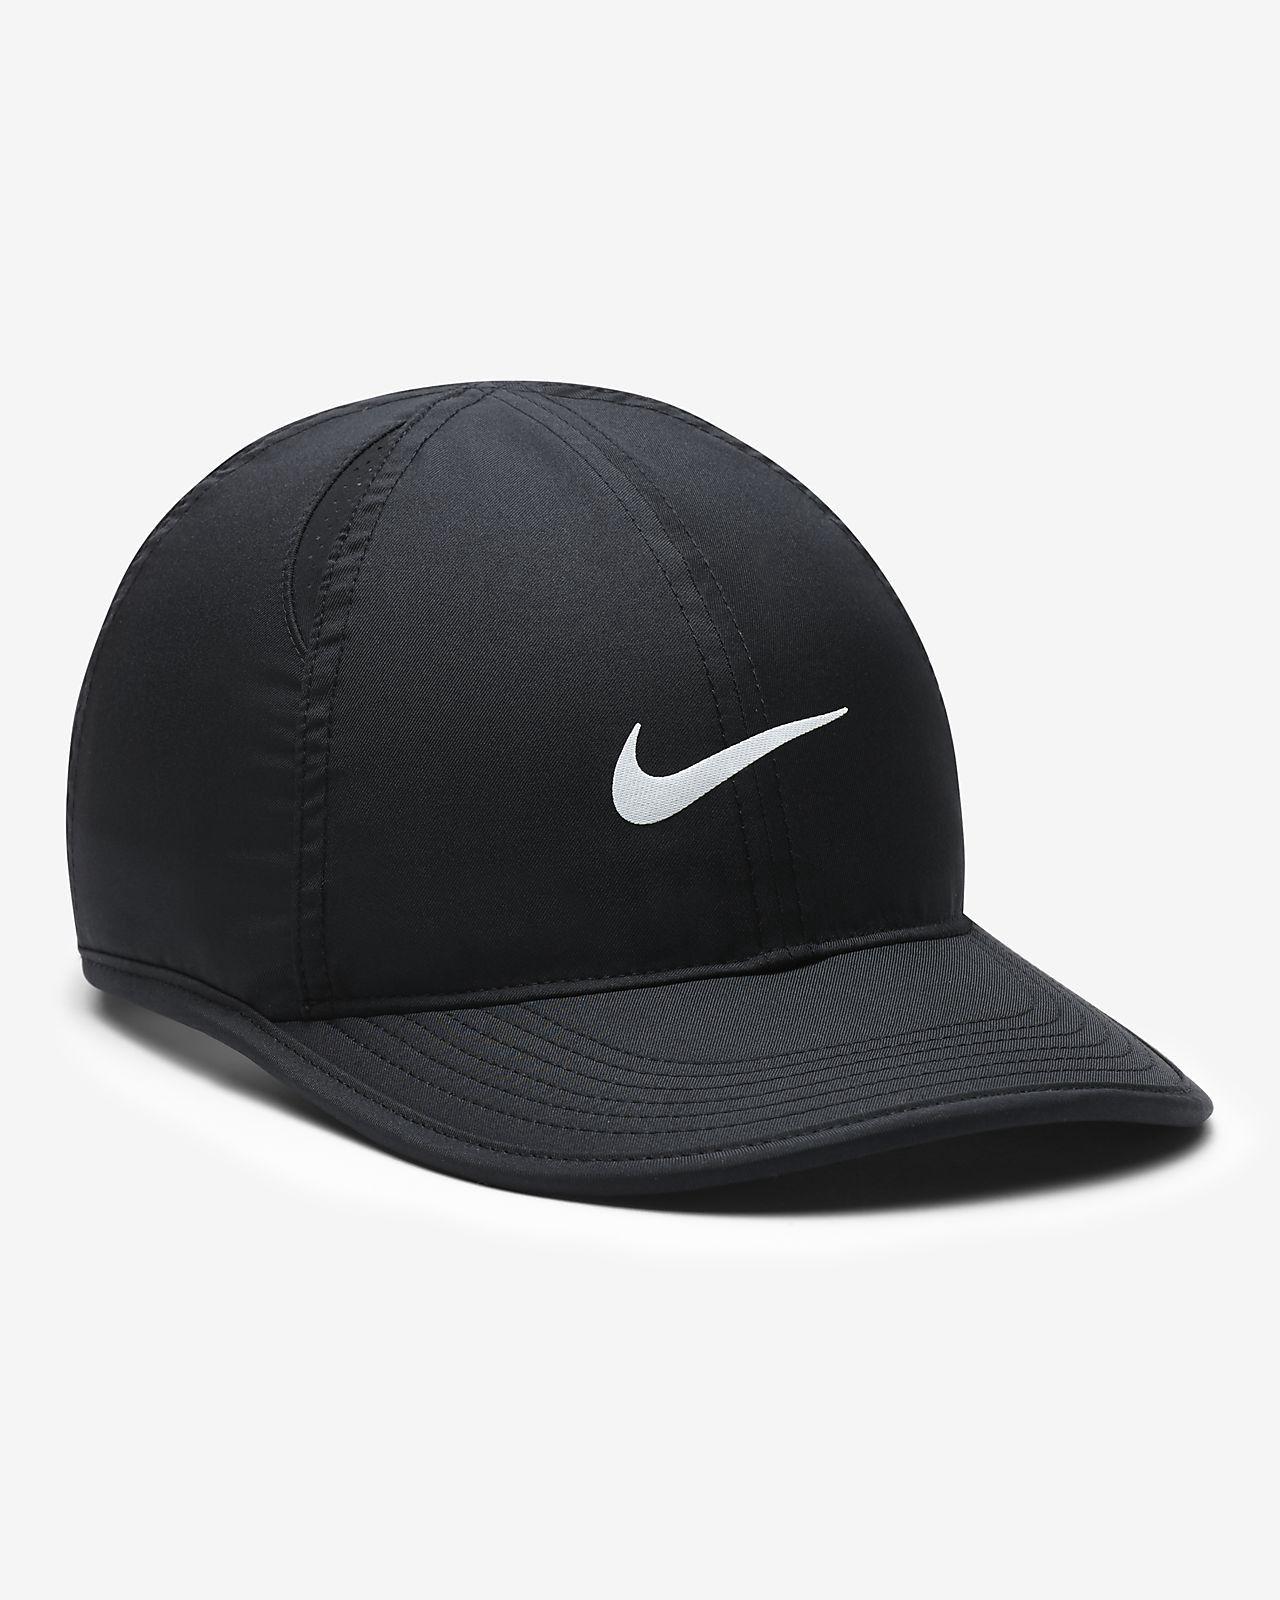 2ad575e5499 Nike Featherlight Big Kids  Adjustable Hat - Black Black White Os ...